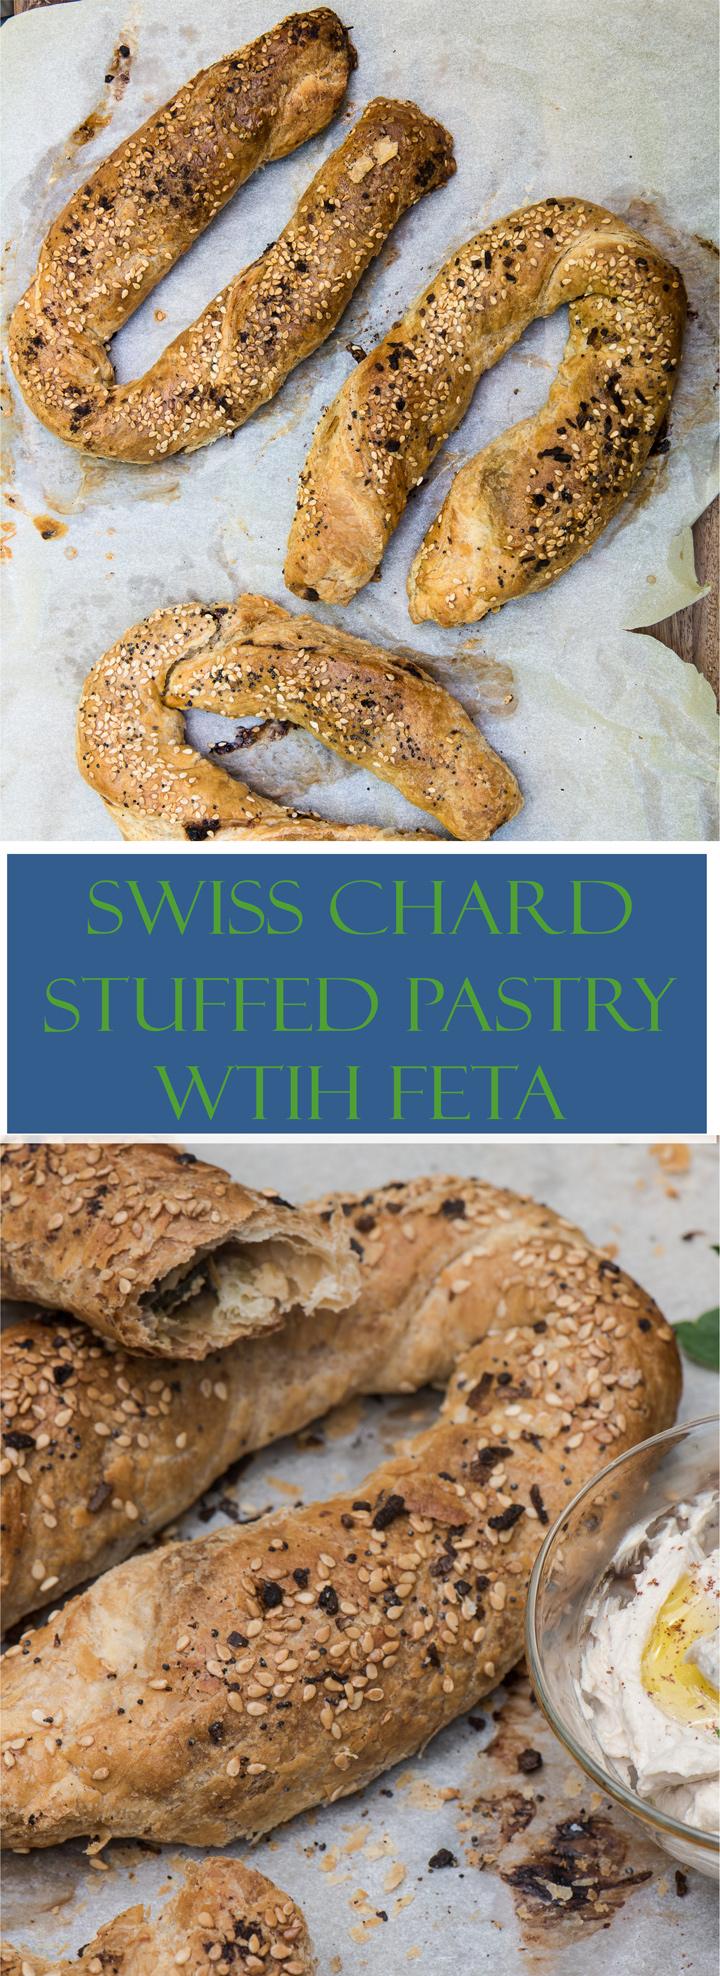 Swiss Chard Stuffed Pastry with Feta recipe